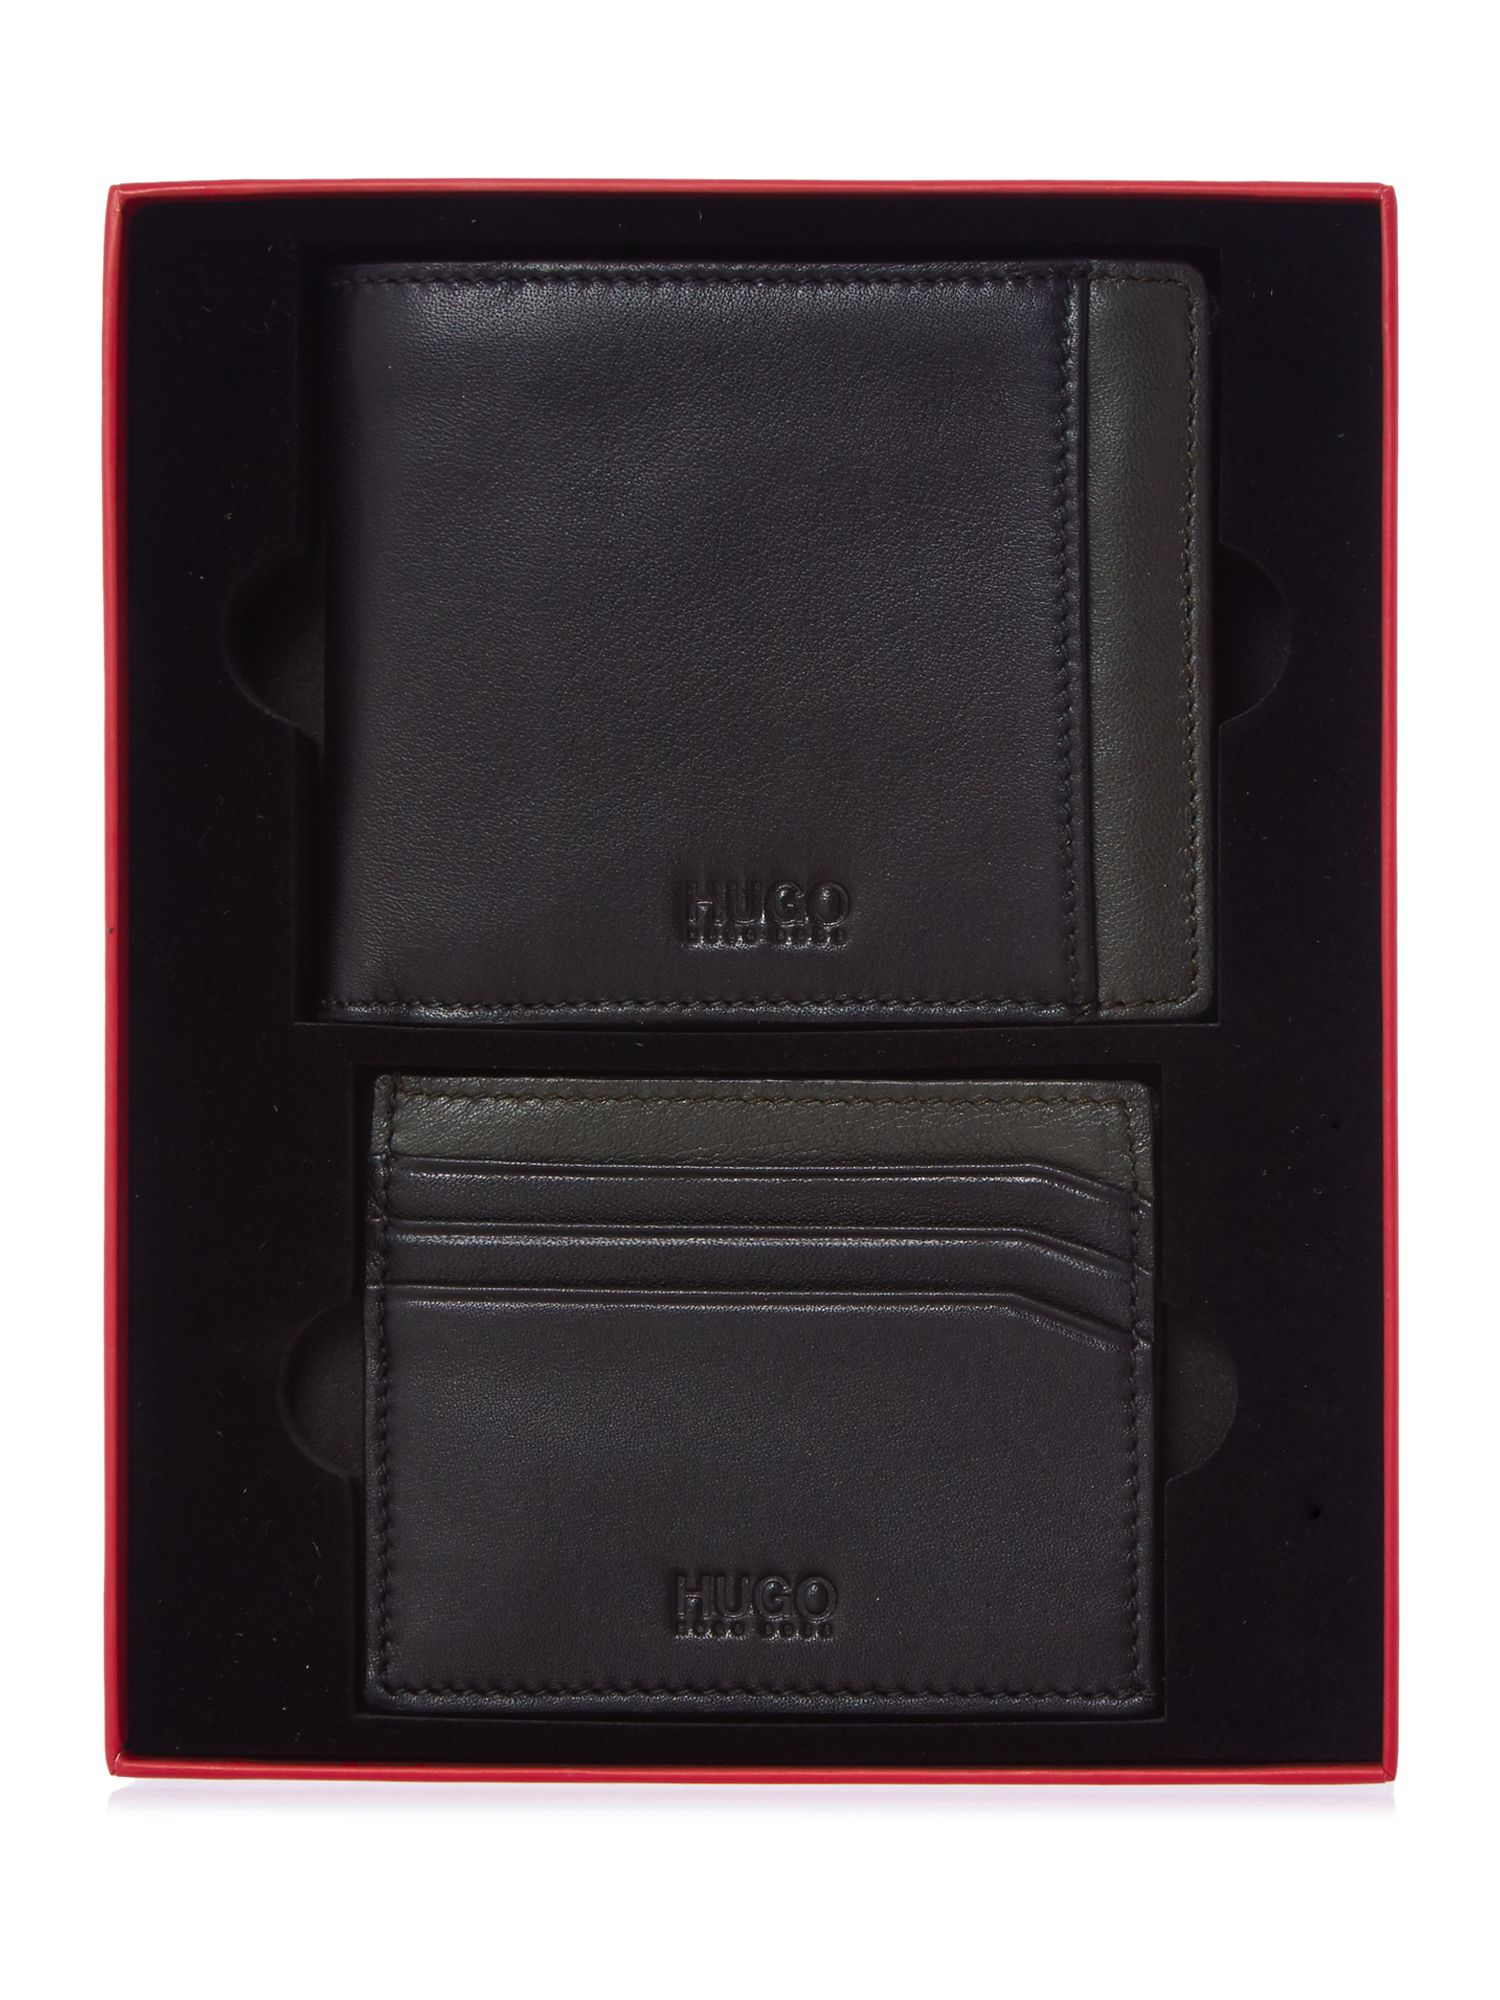 Hugo boss metal business card holder teduh hostel hugo boss metal business card holder colourmoves